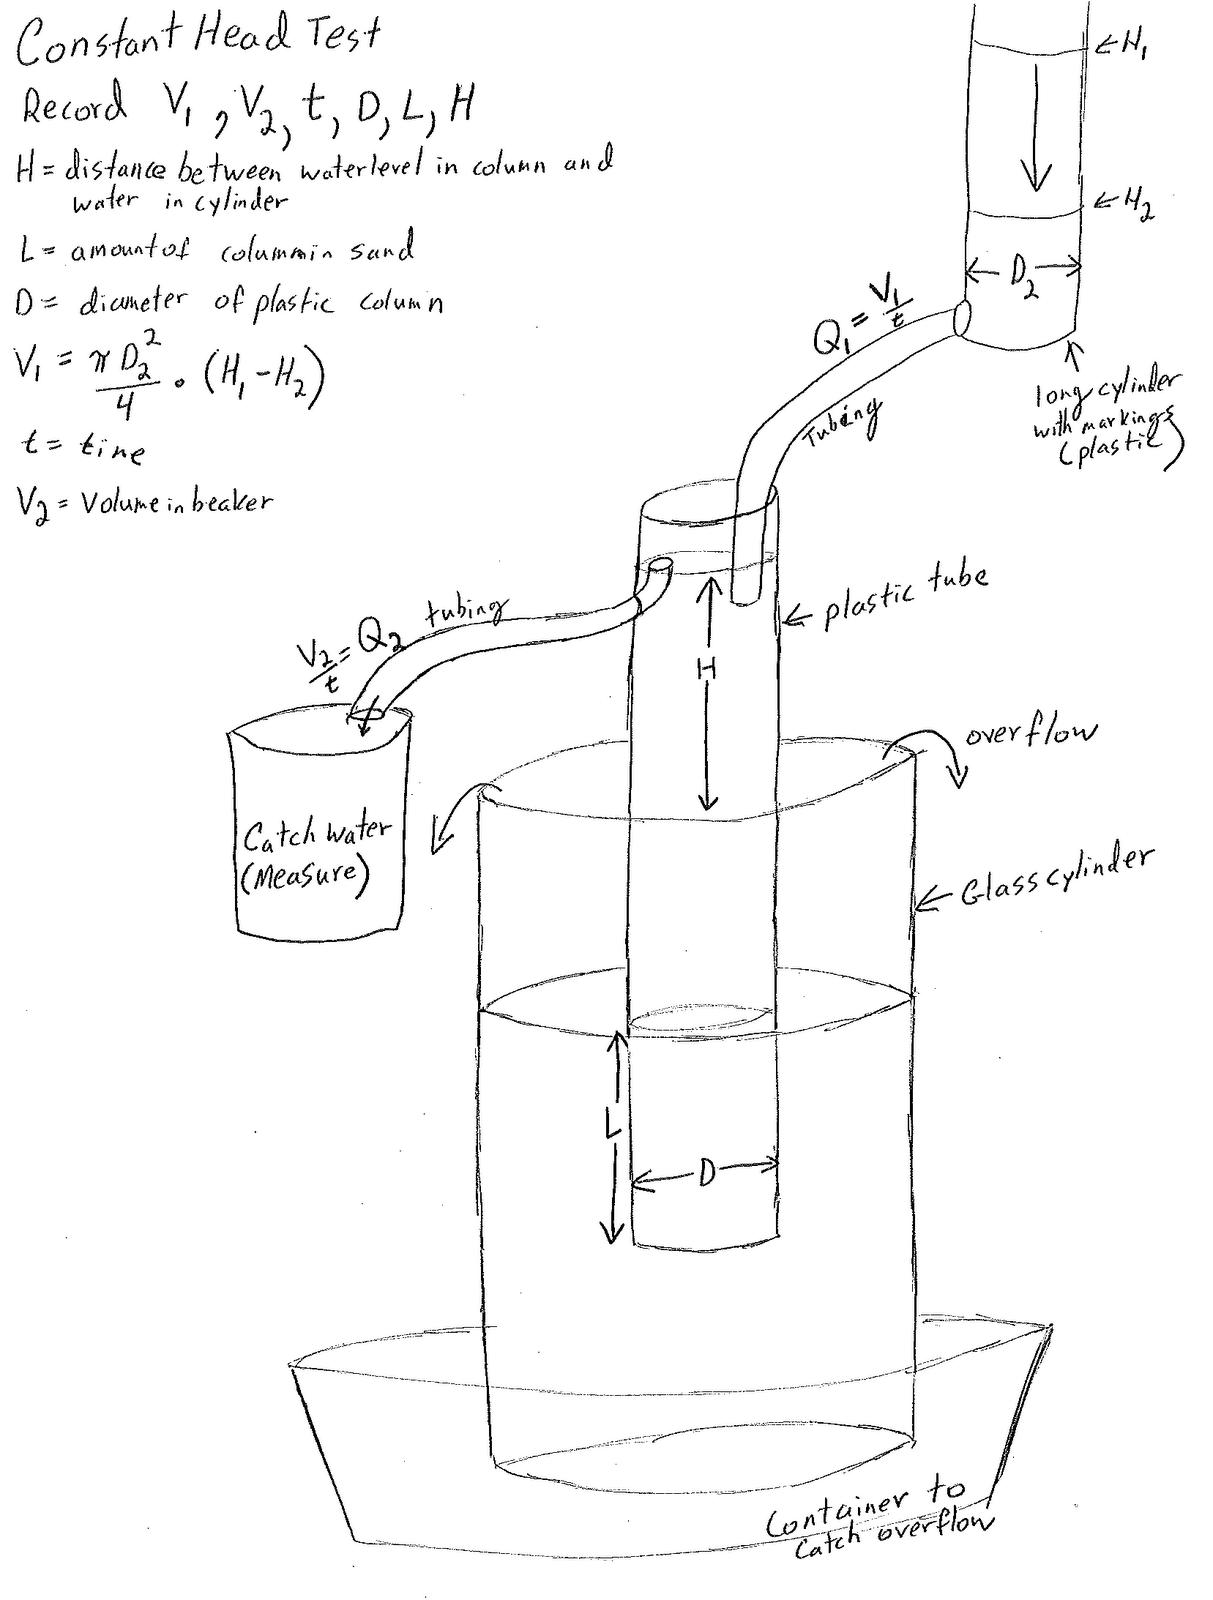 hight resolution of sau hydraulic conductivity 2012 the constant head test